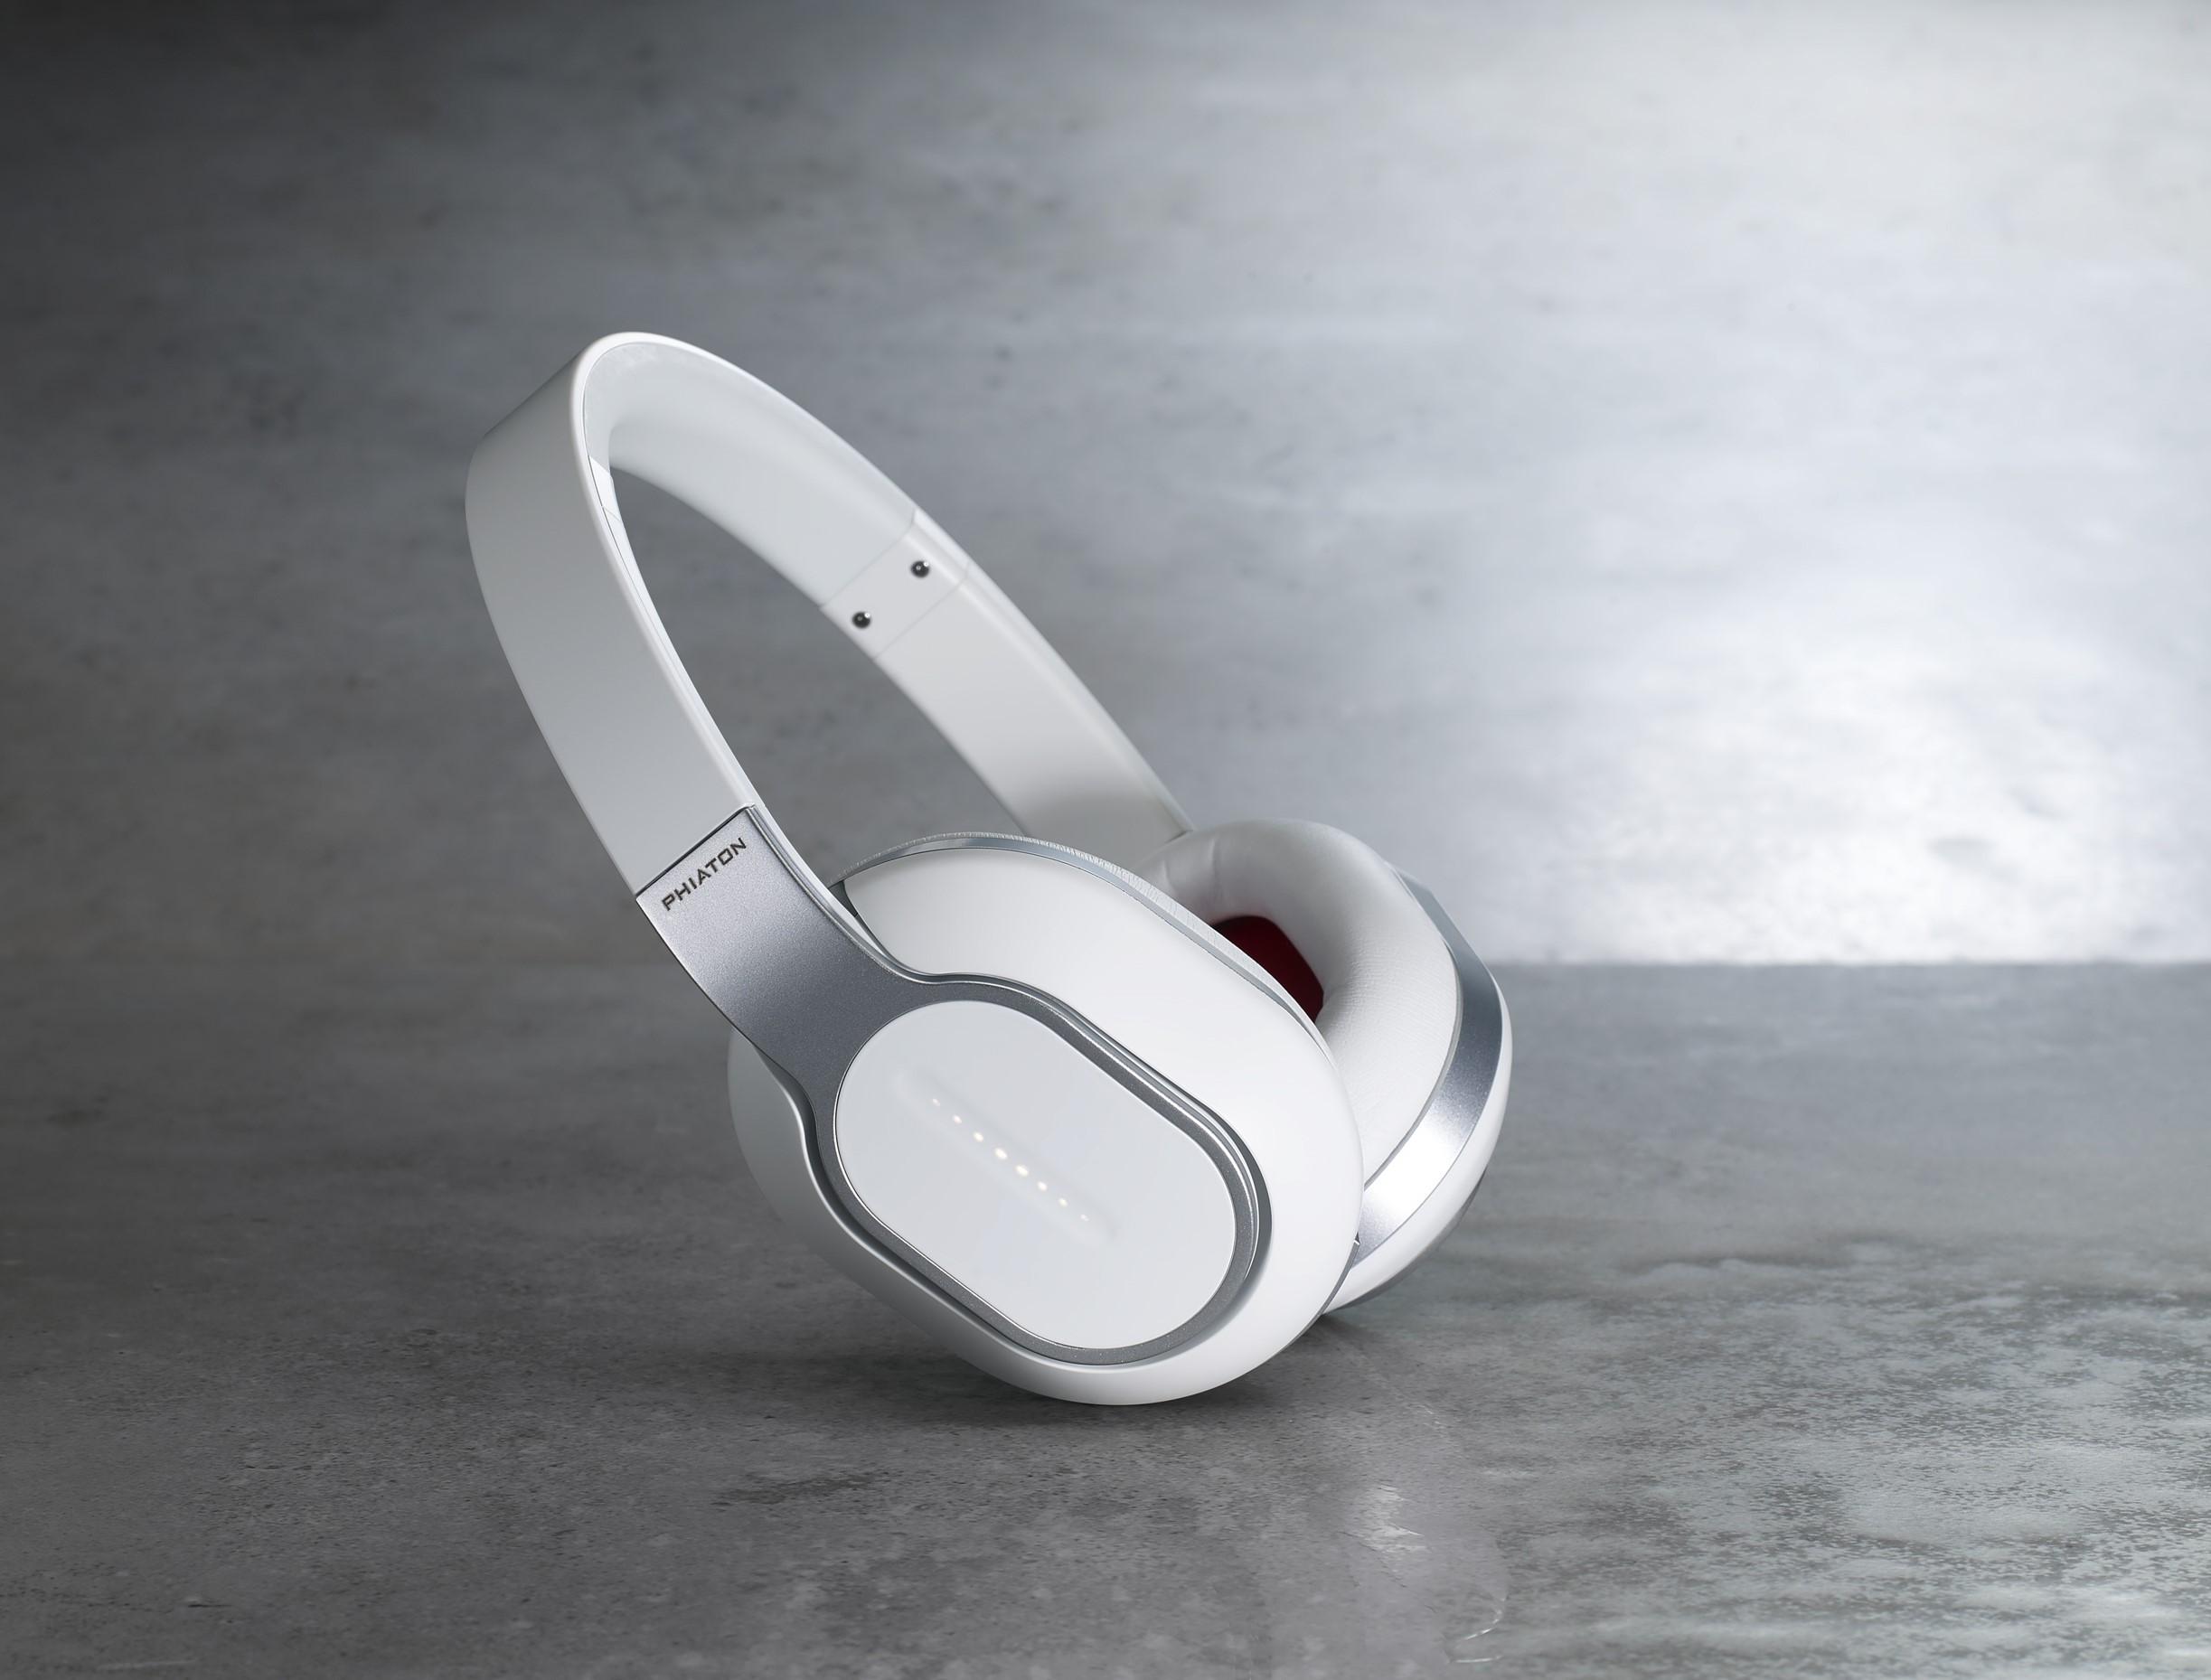 Phiaton-BT-460-wireless-headphones.jpg